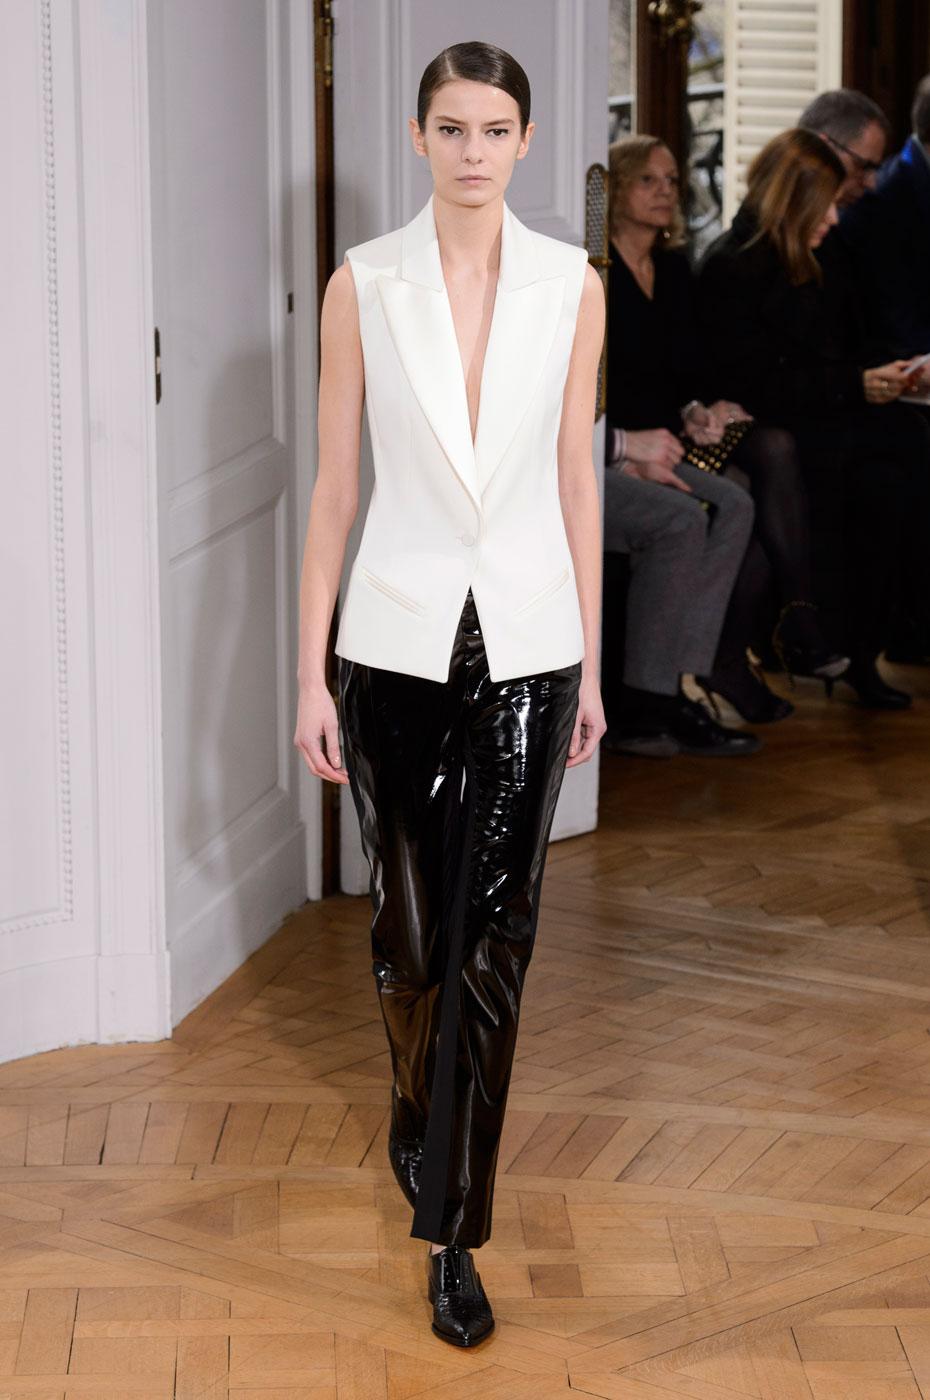 Bouchra-Jarrar-fashion-runway-show-haute-couture-paris-spring-summer-2015-the-impression-41